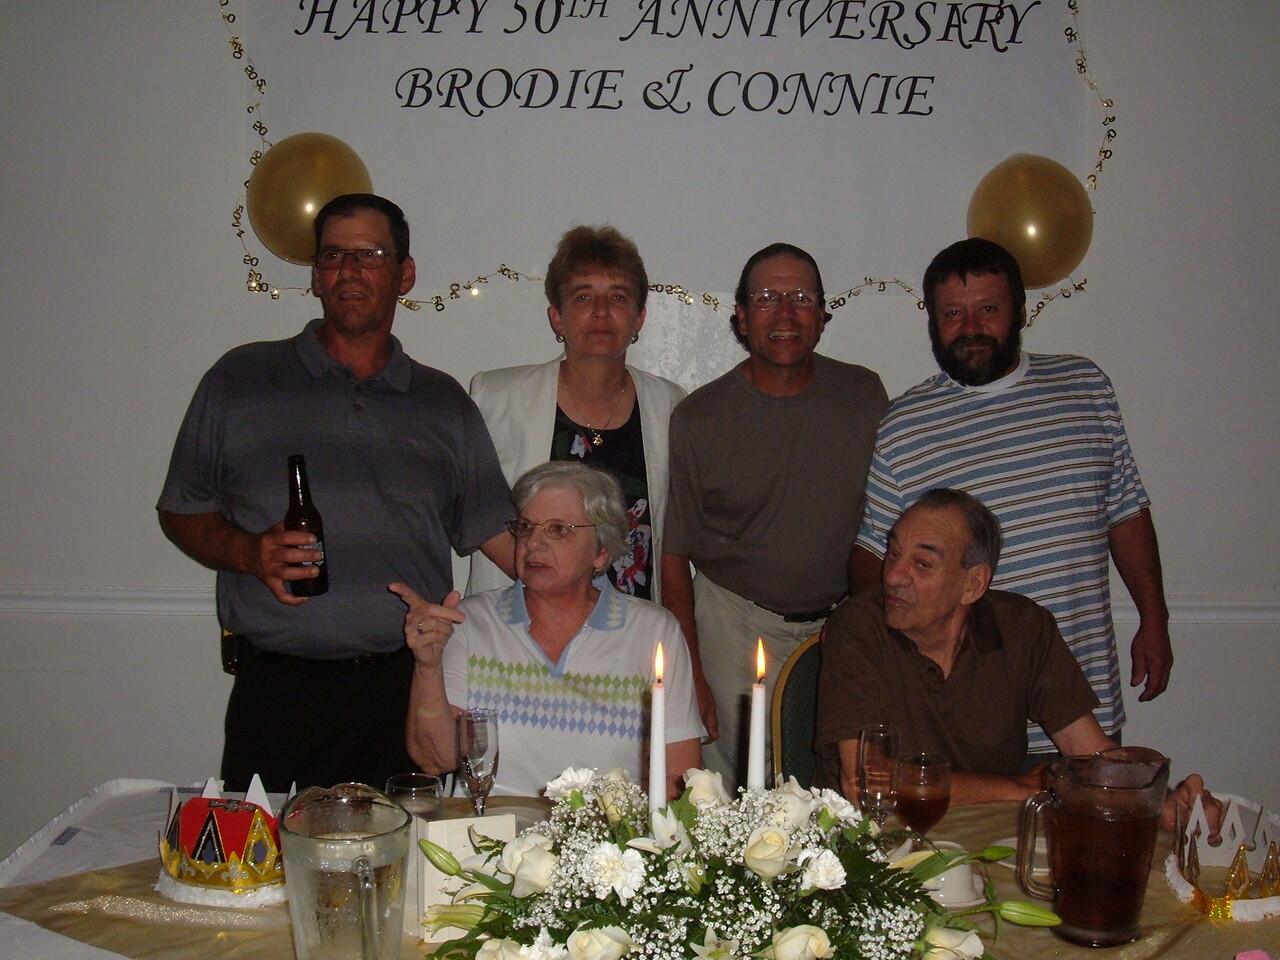 Finamore Family<br /> Standing:  Larry, Debbie, Bink, Eddie<br /> Sitting: Connie and Brodie